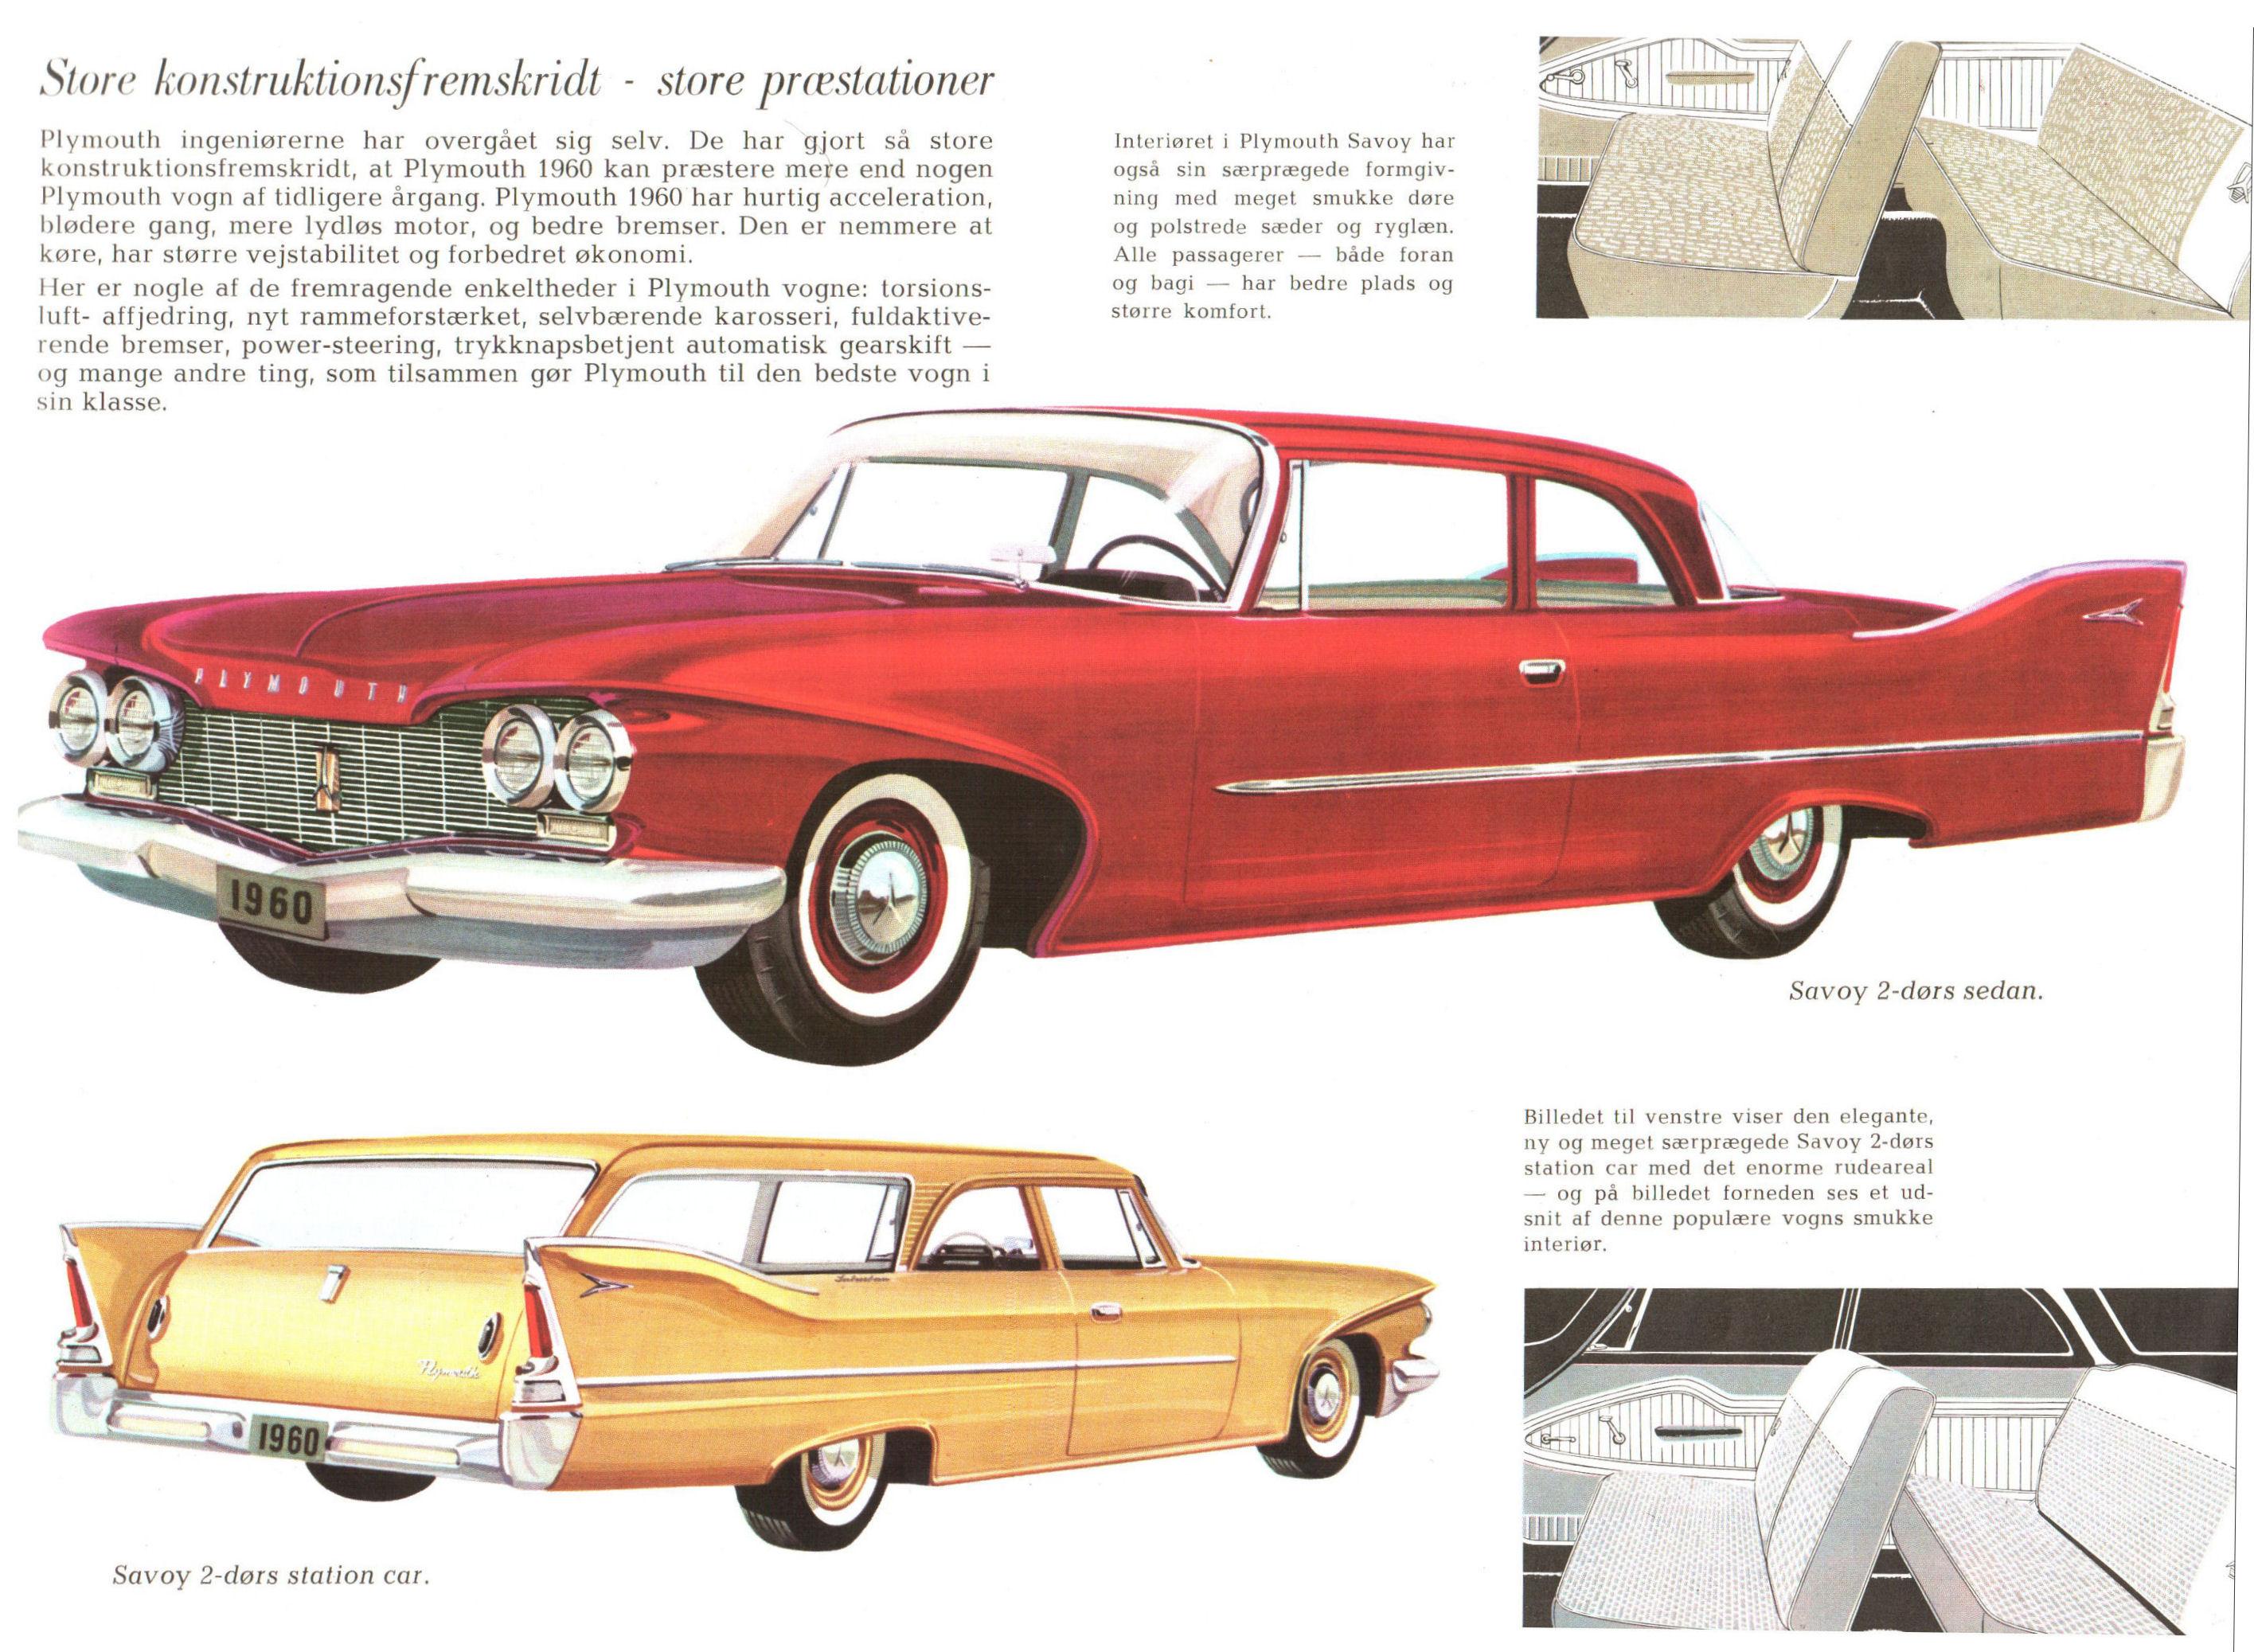 1960 Plymouth Brochure Danish Savoy Sedan Full Size Image